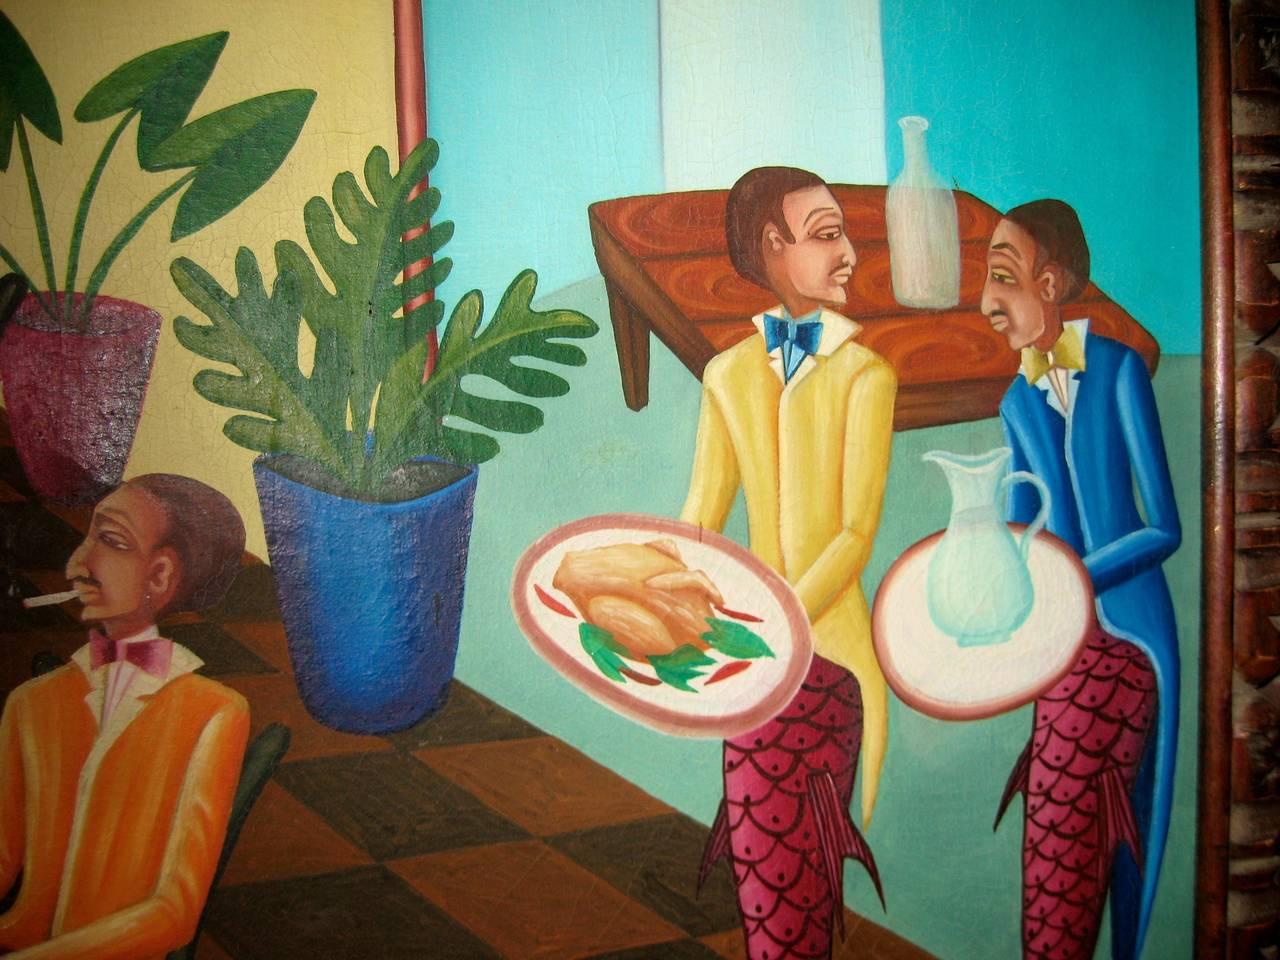 Surrealist Restaurant Scene with Mermades and Mermen 7